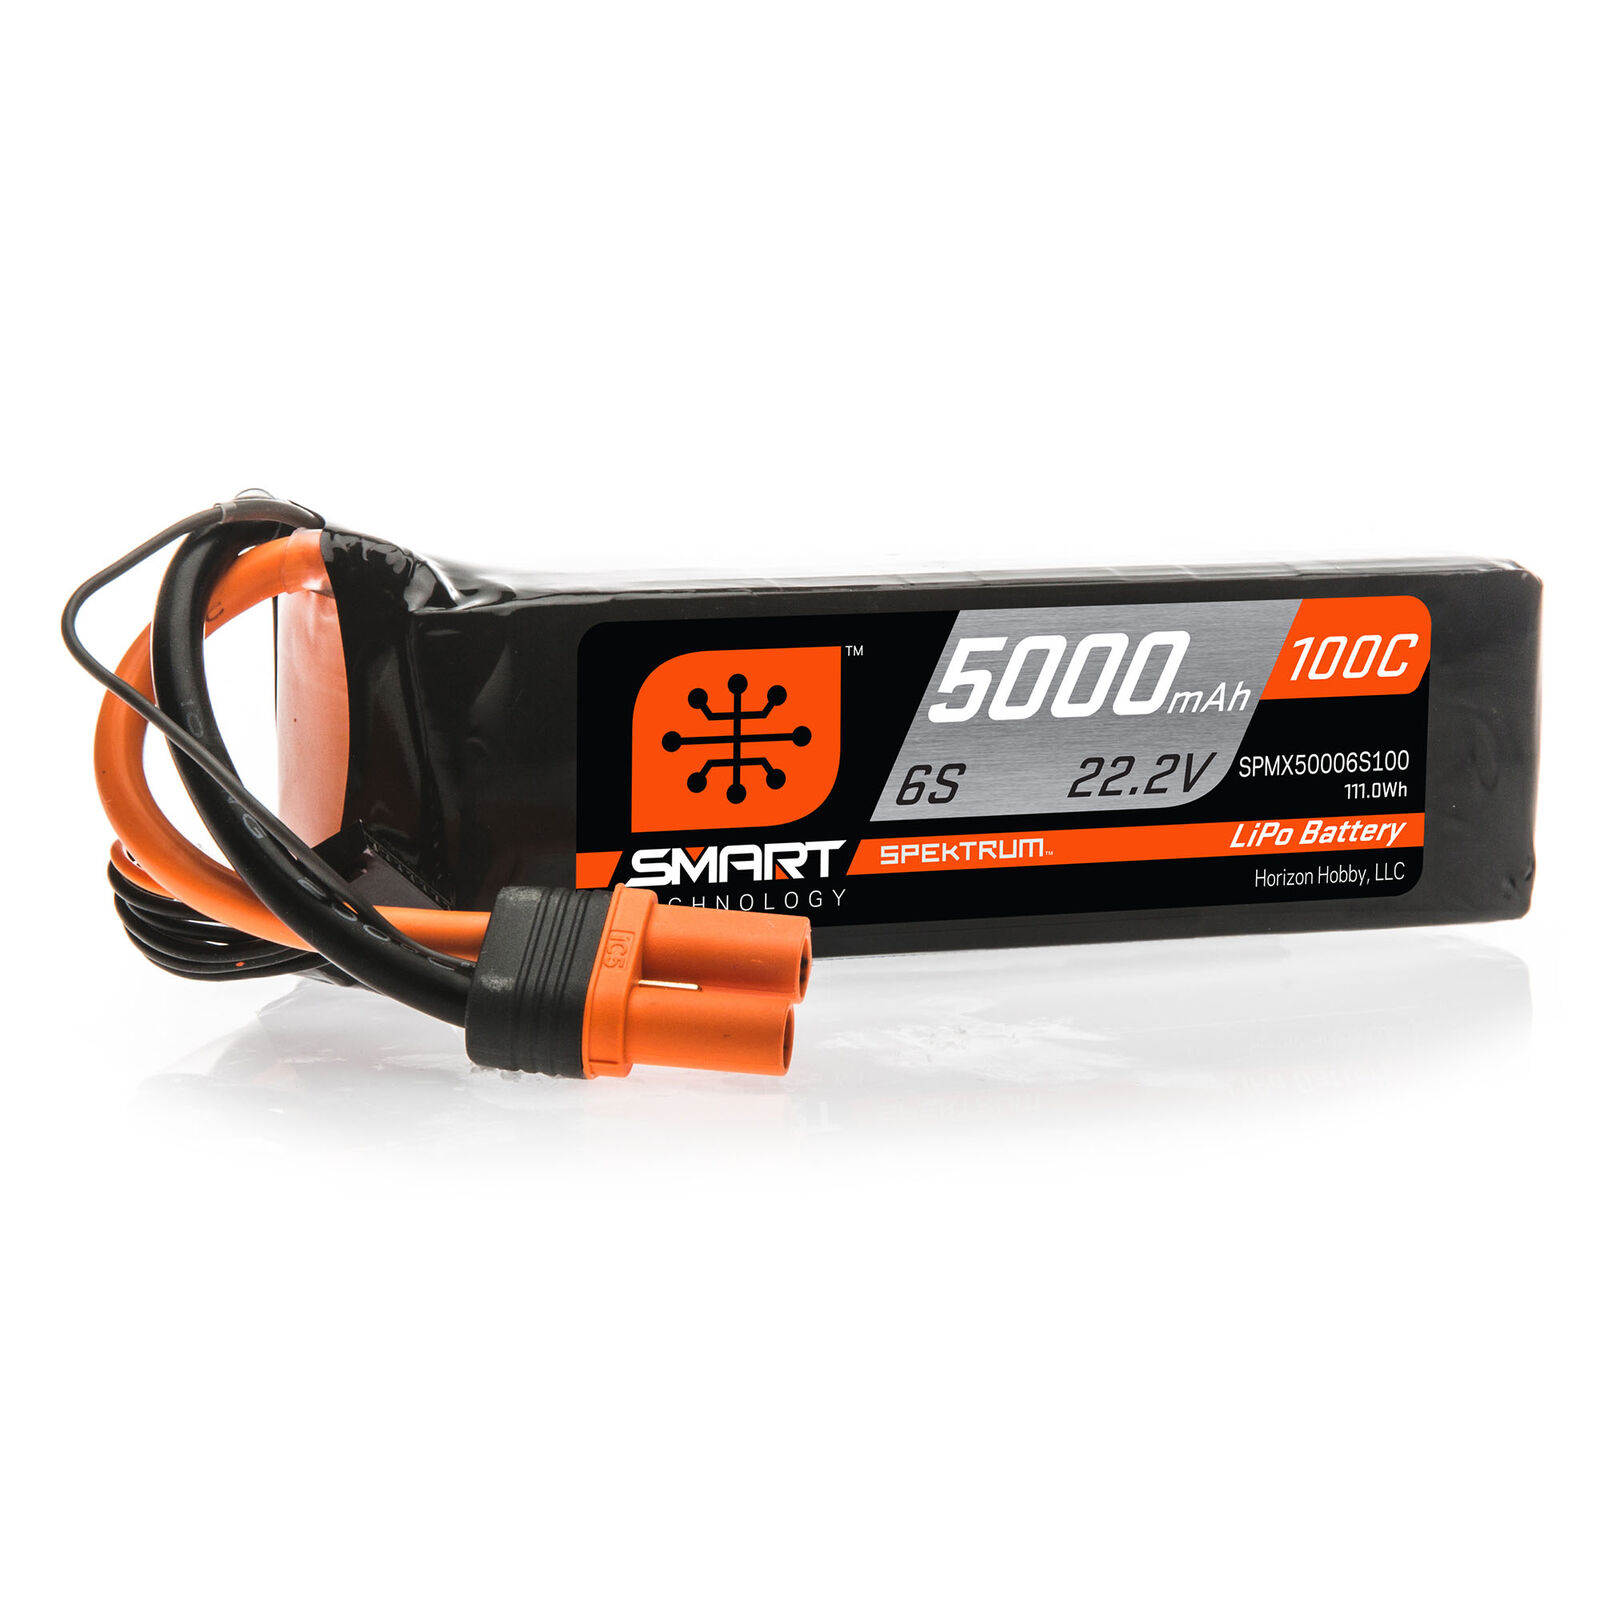 22.2V 5000mAh 6S 100C Smart LiPo Battery: IC5